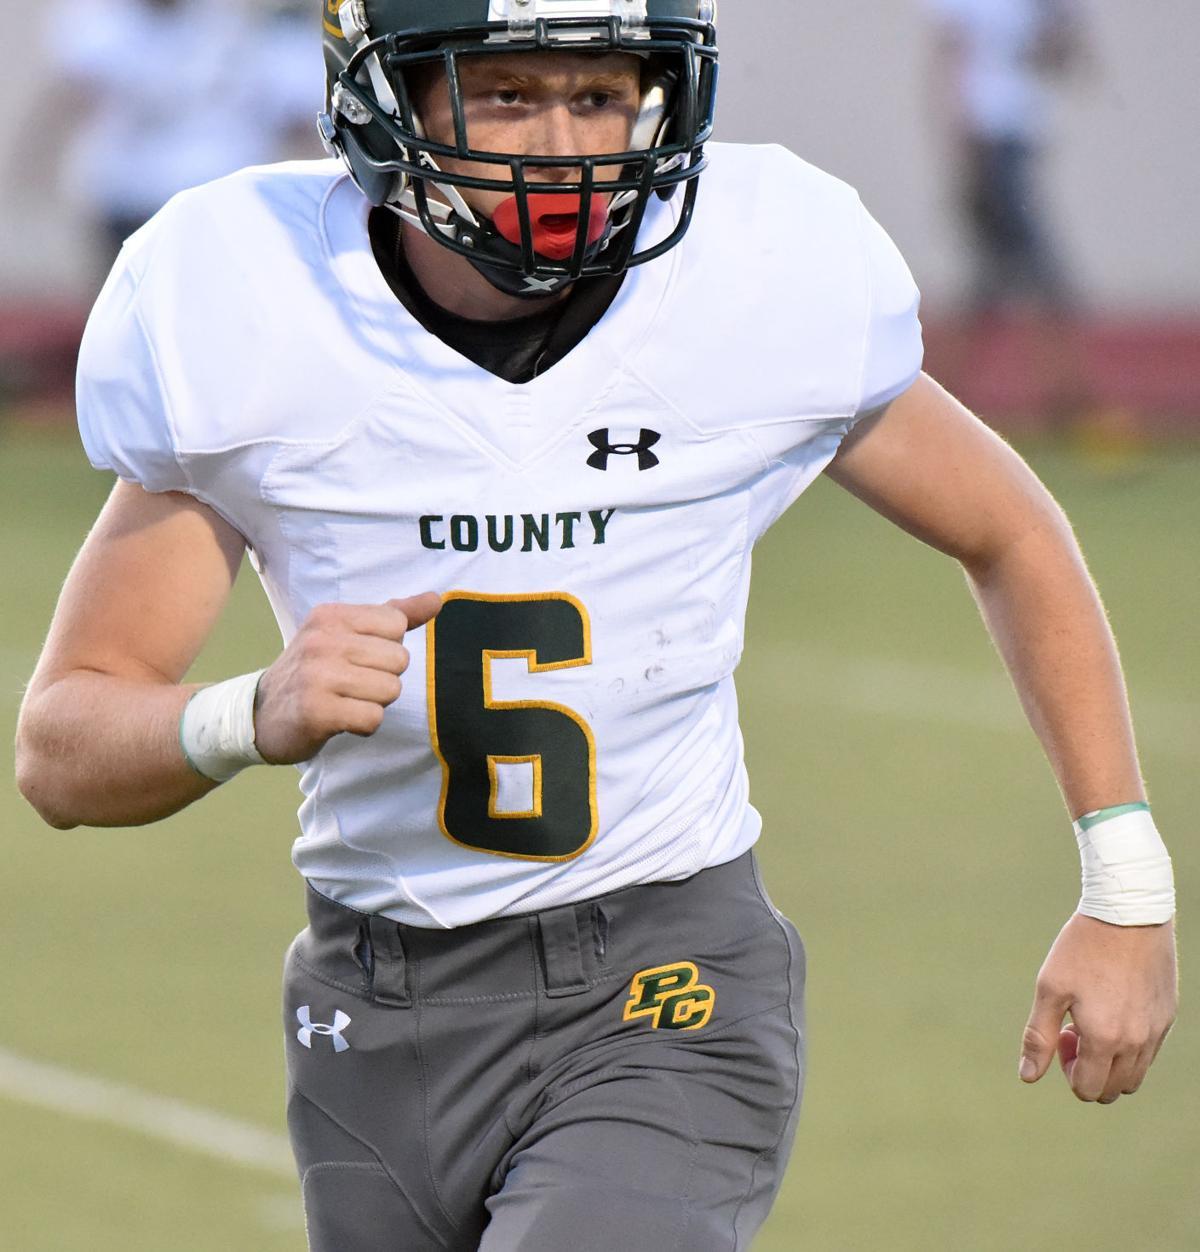 PHOTOS: Harrison Panthers (21) Pueblo County Hornets (14)